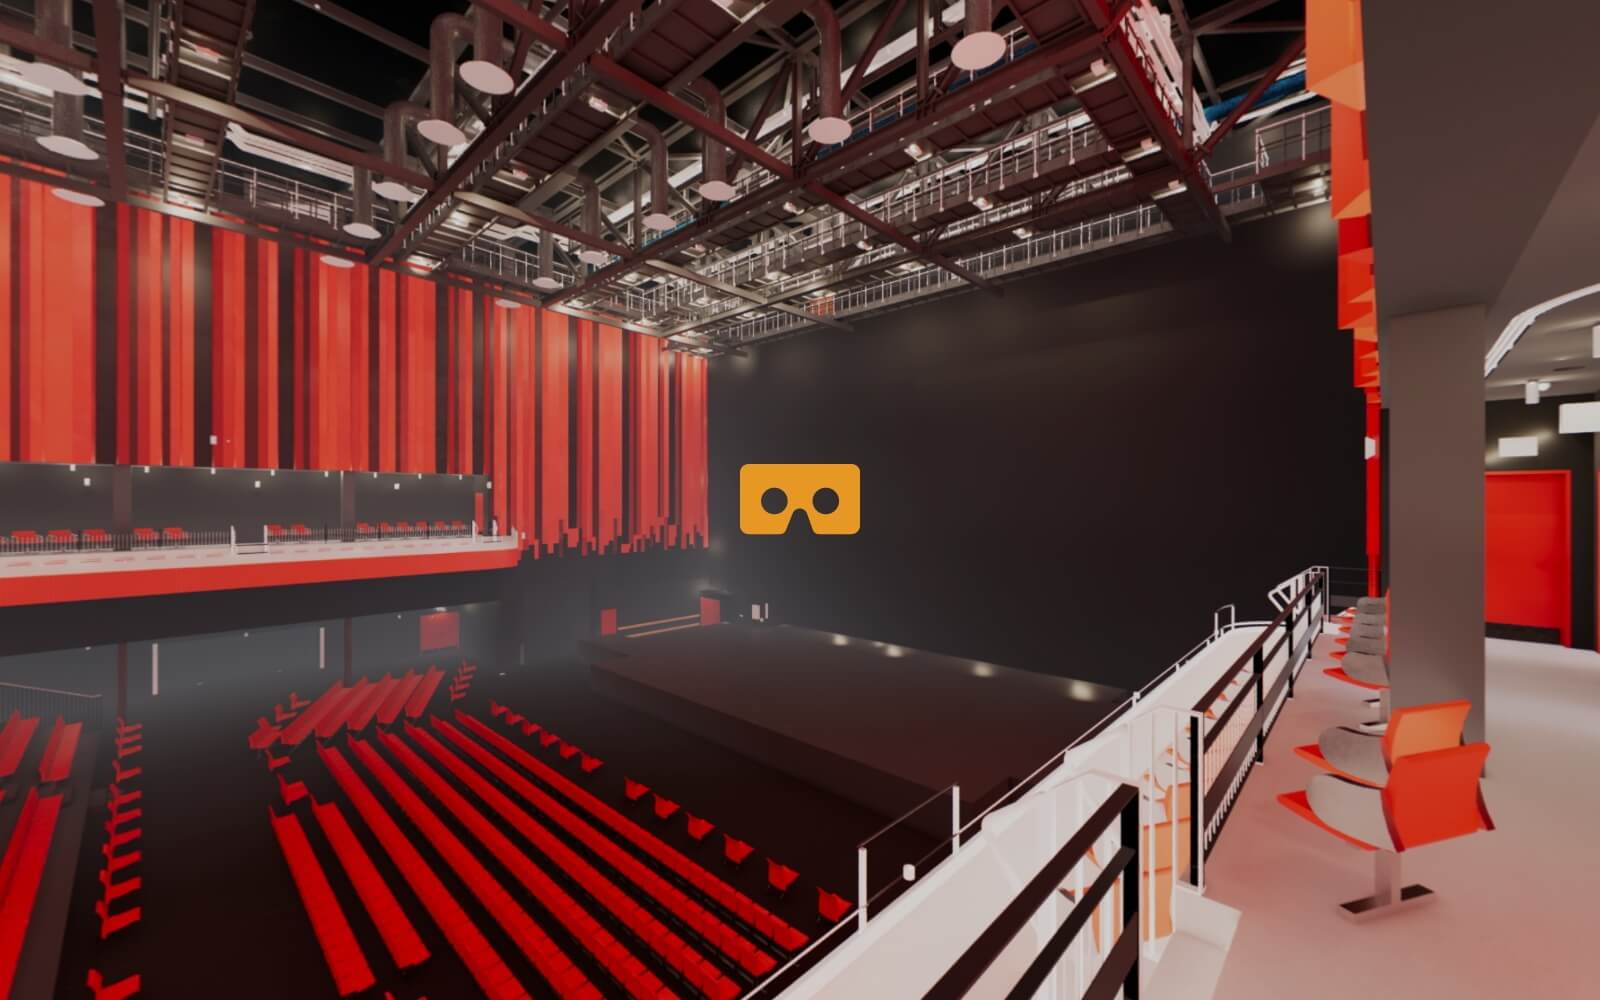 Arena 360 image